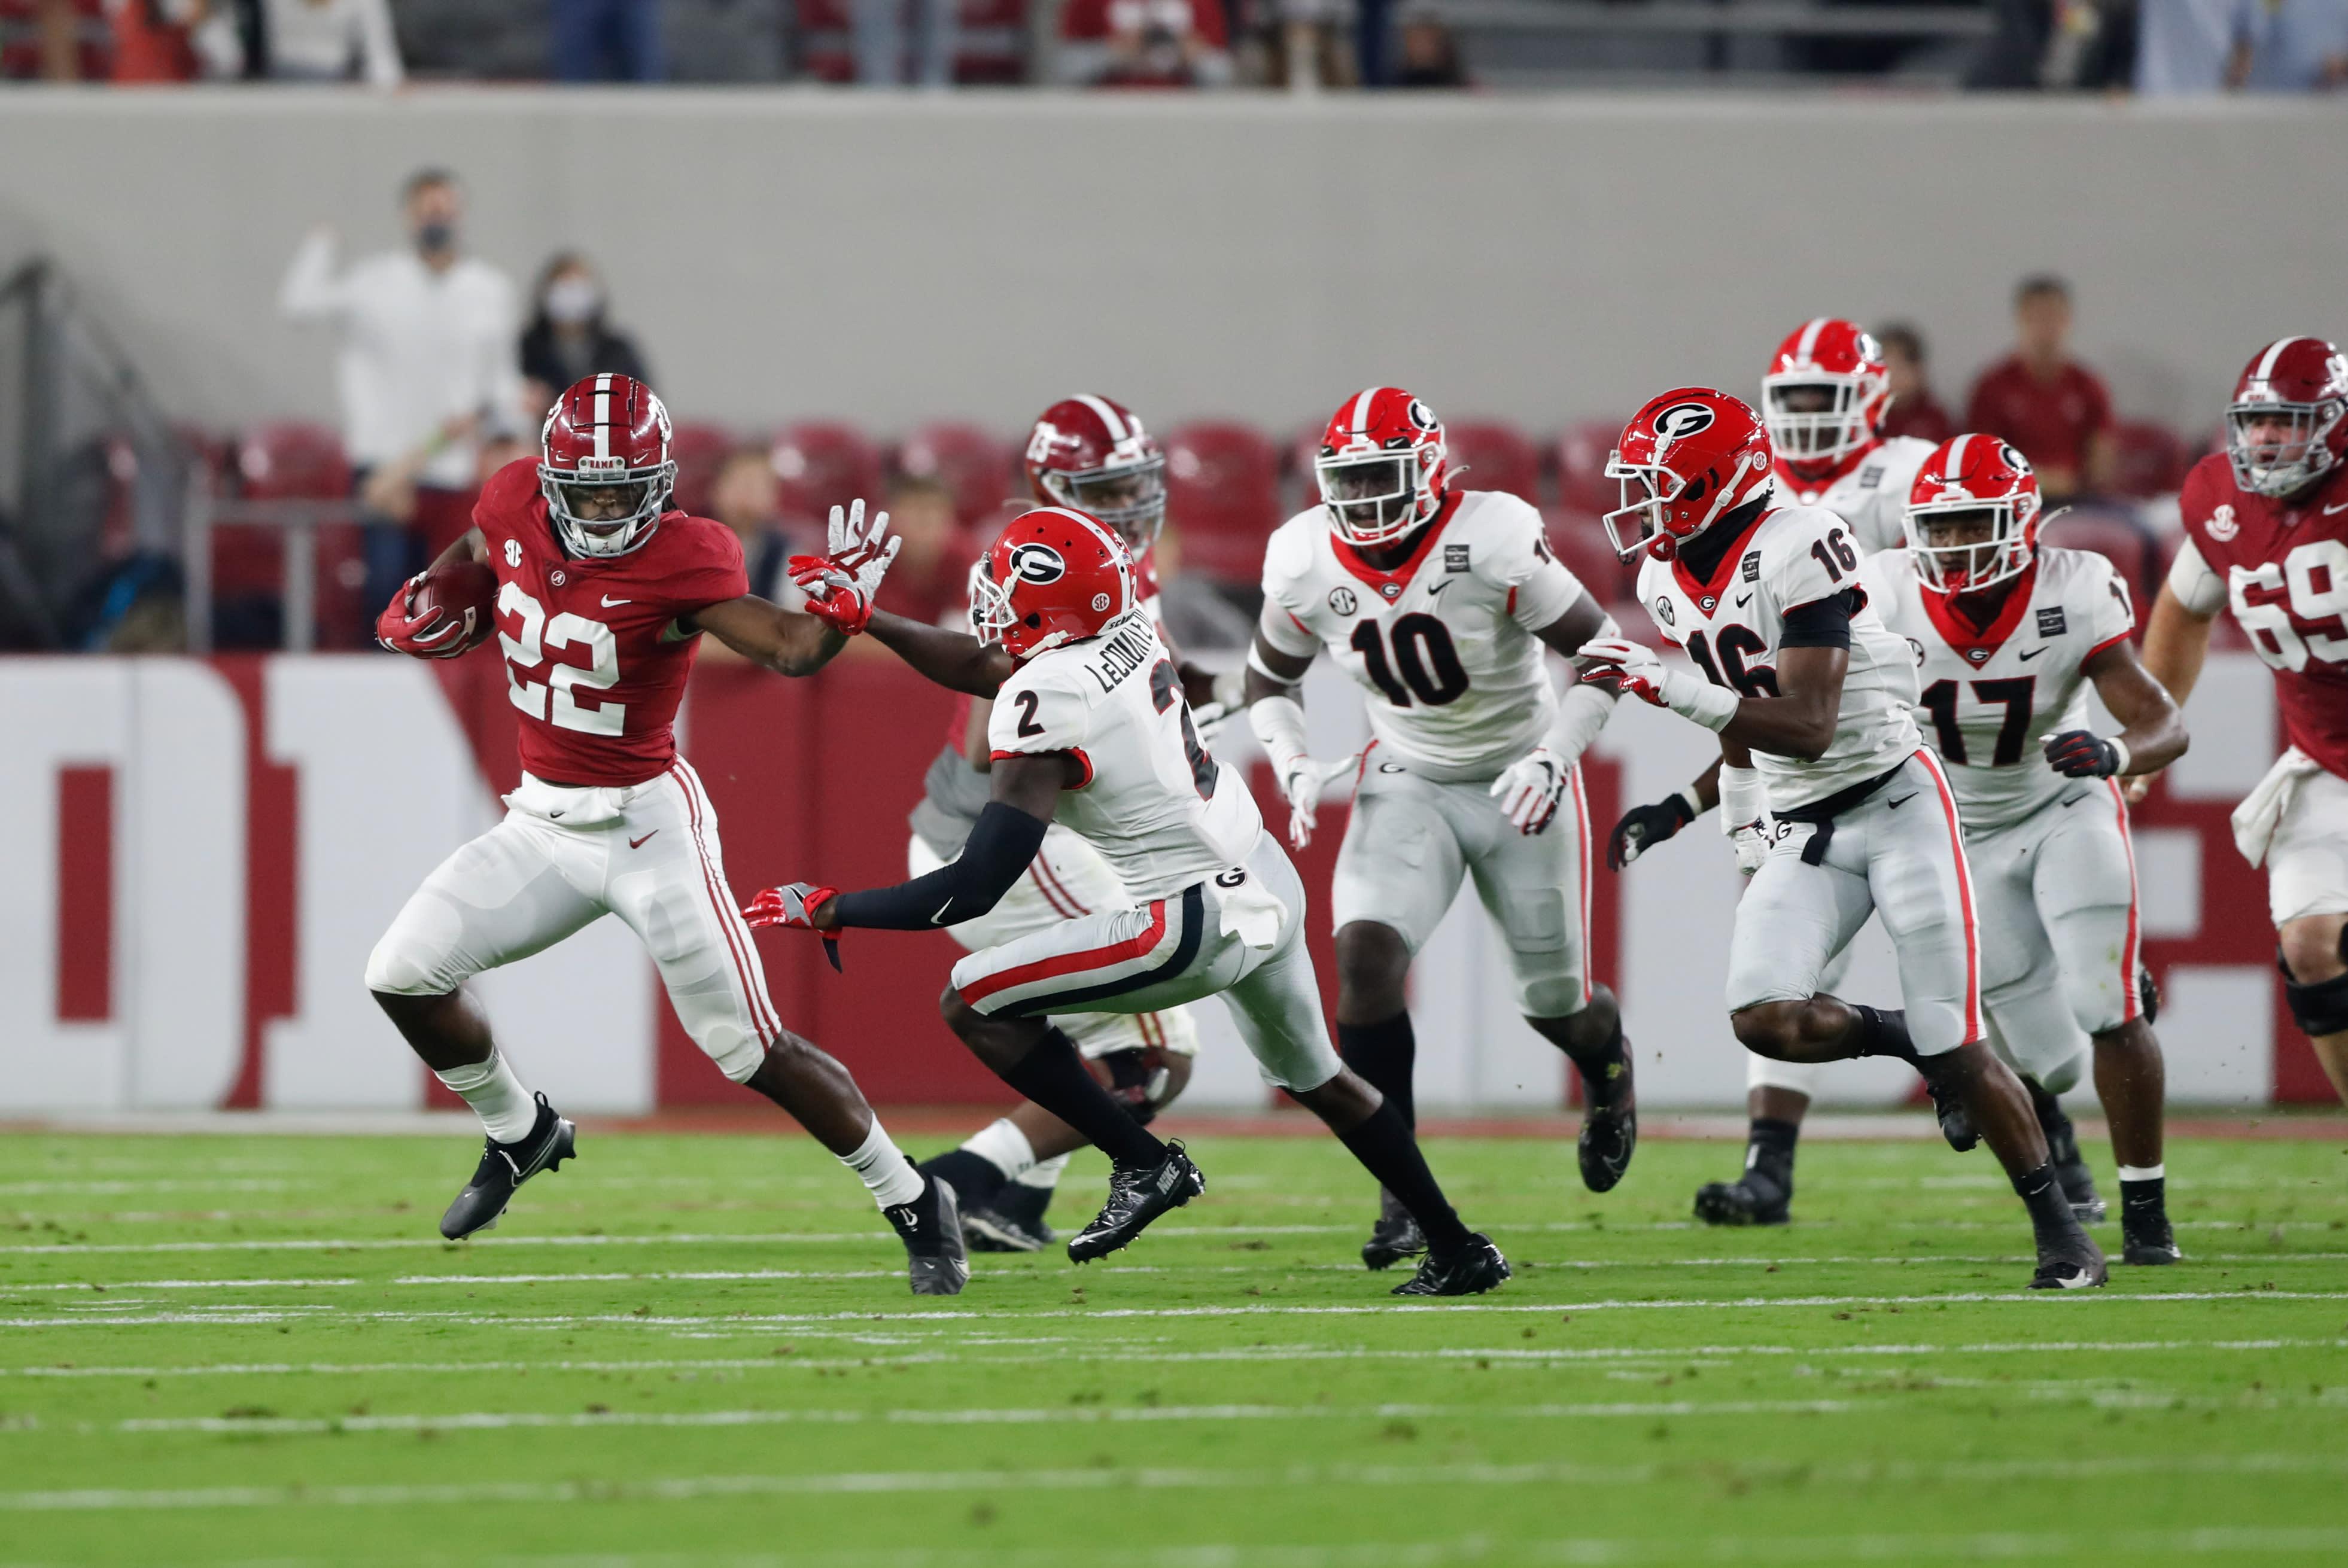 NCAA Football: Georgia drops to No. 4 in AP Top 25